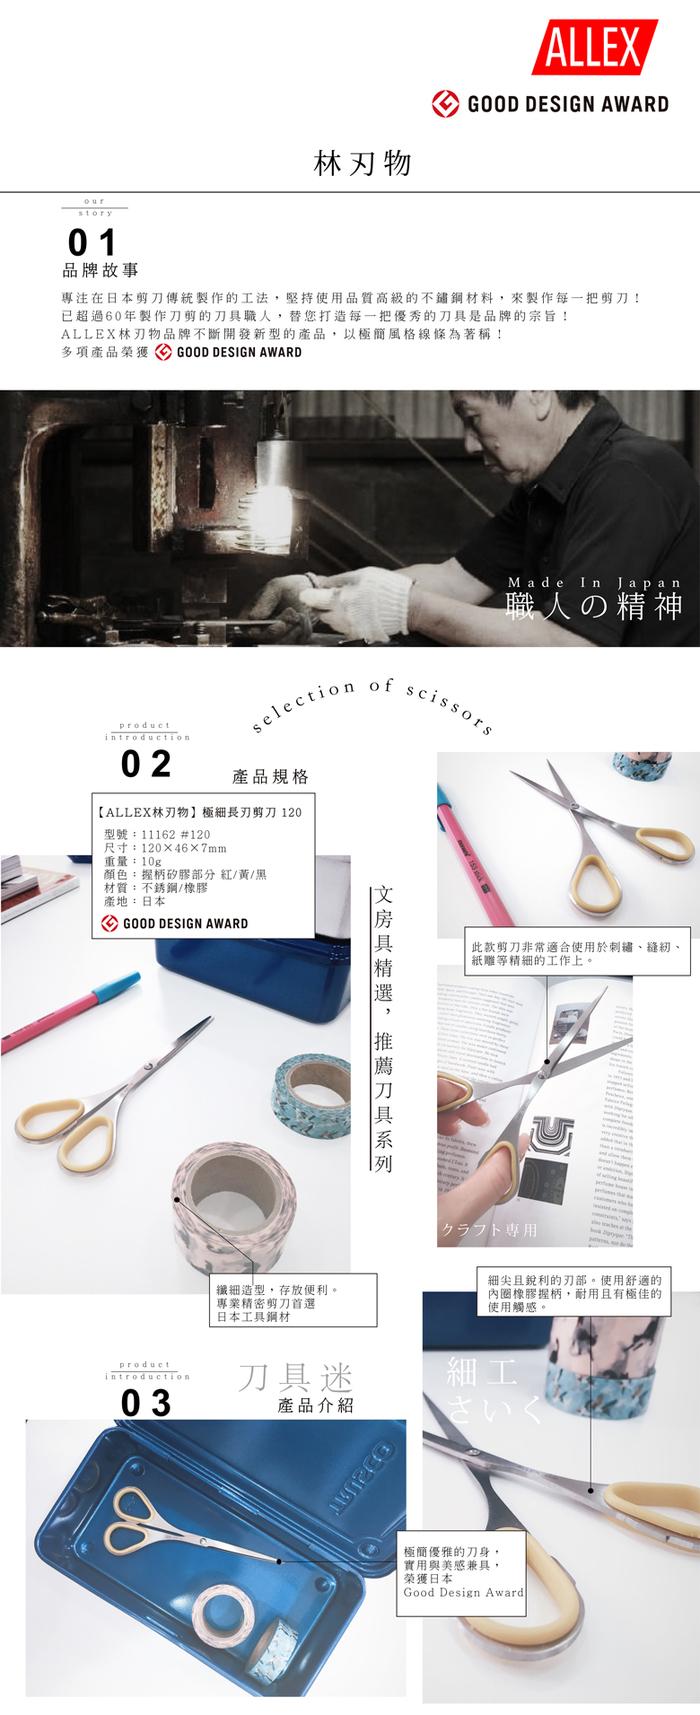 ALLEX林刃物|極細長刃剪刀(中)120mm- 黃